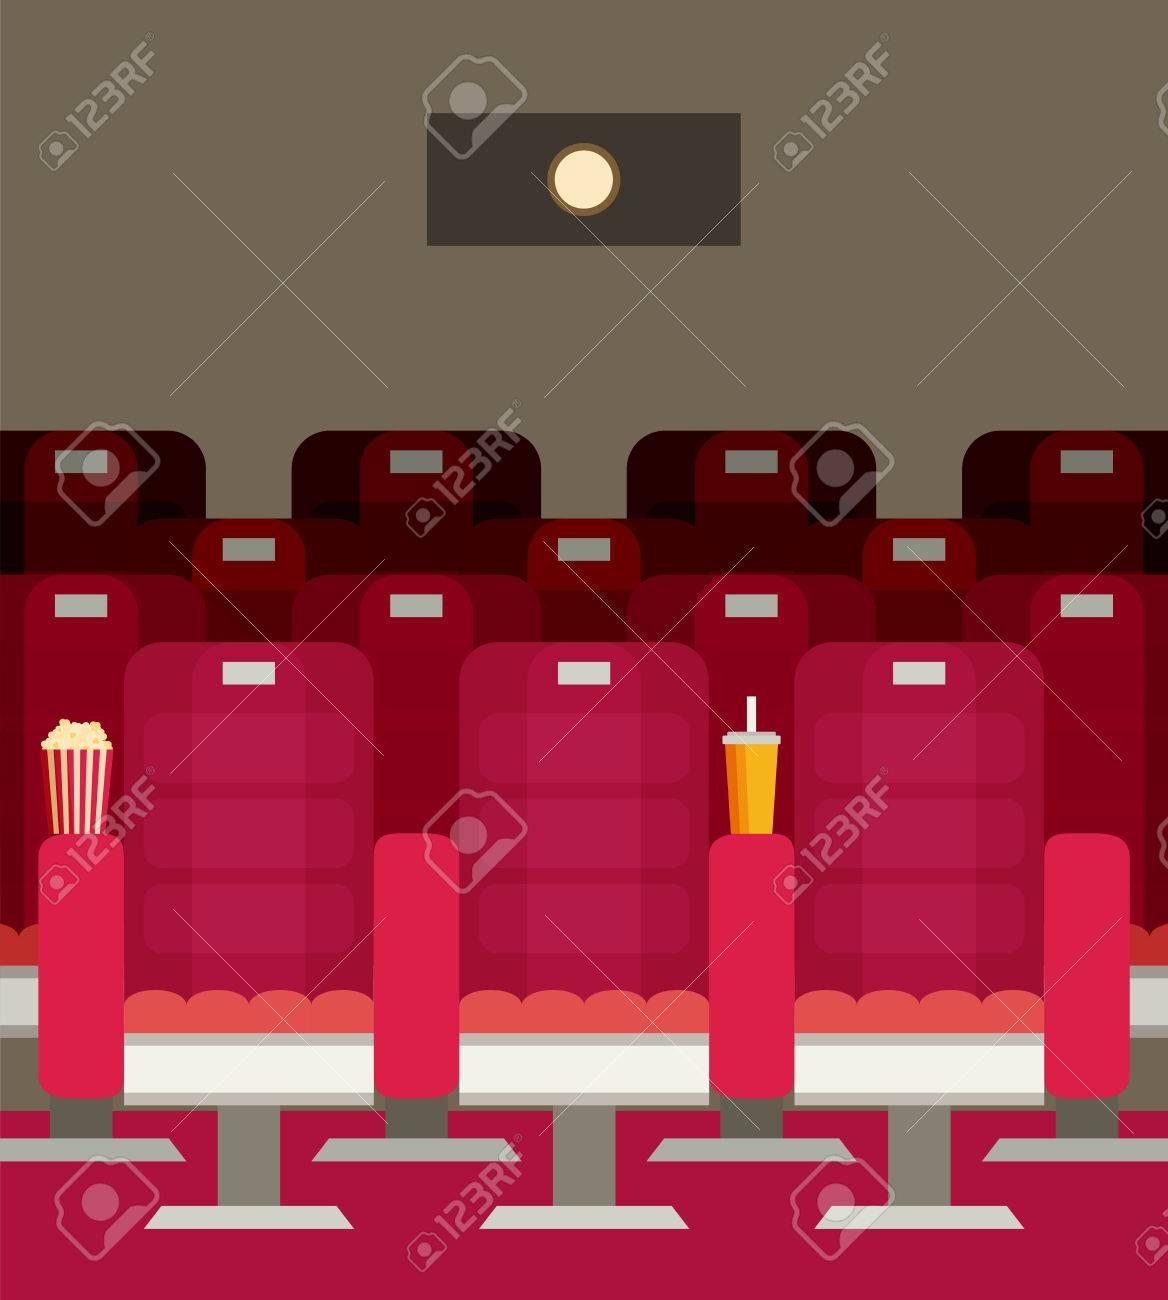 Cinema Chairs With Popcorn, Soda. Vector Illustration. Stock Vector    65225944